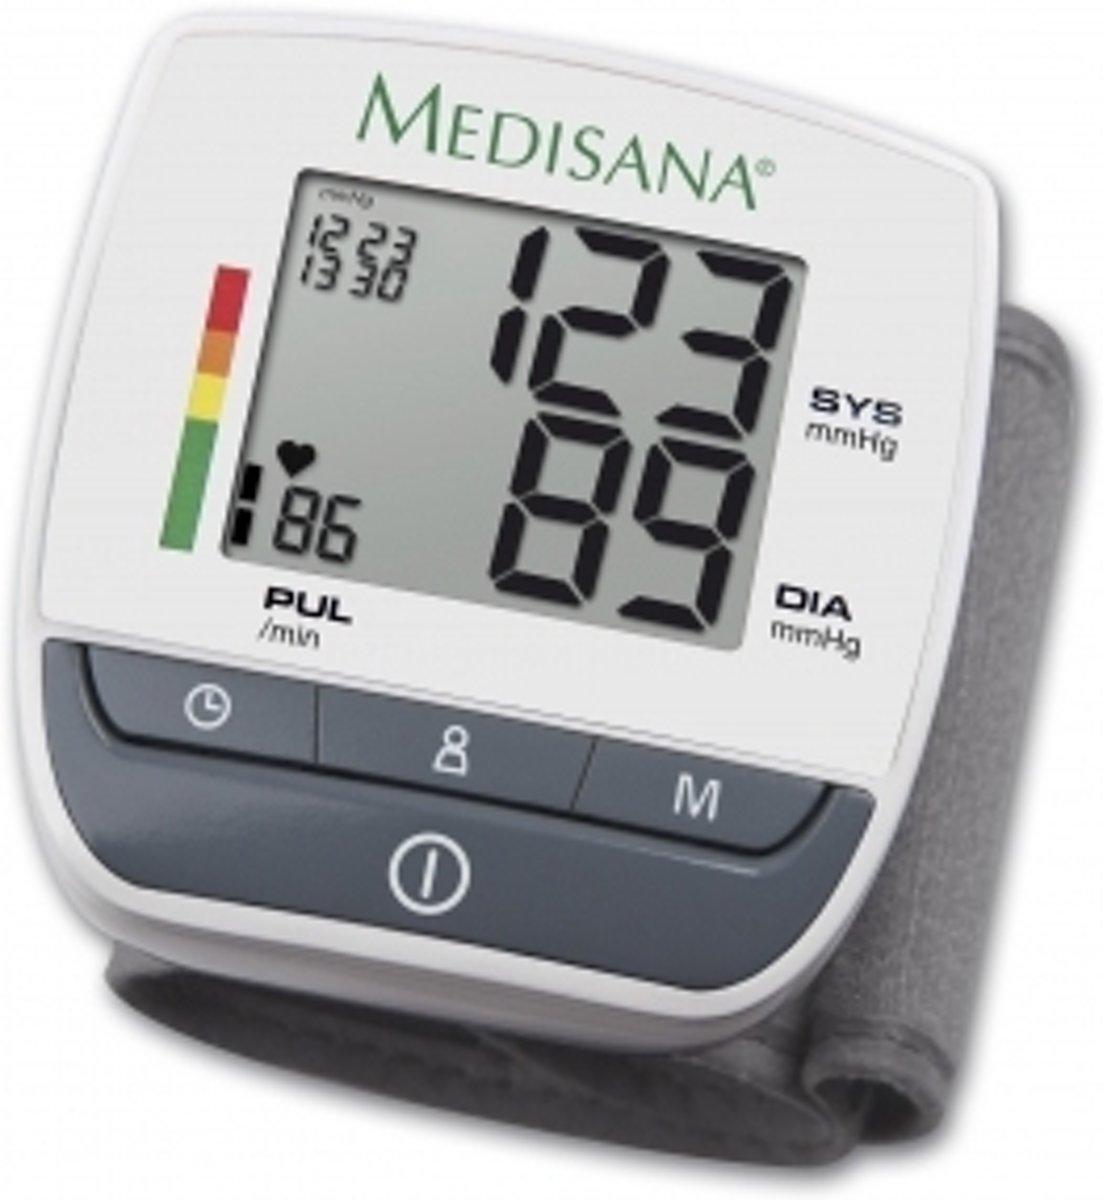 Medisana BW310 - Polsbloeddrukmeter